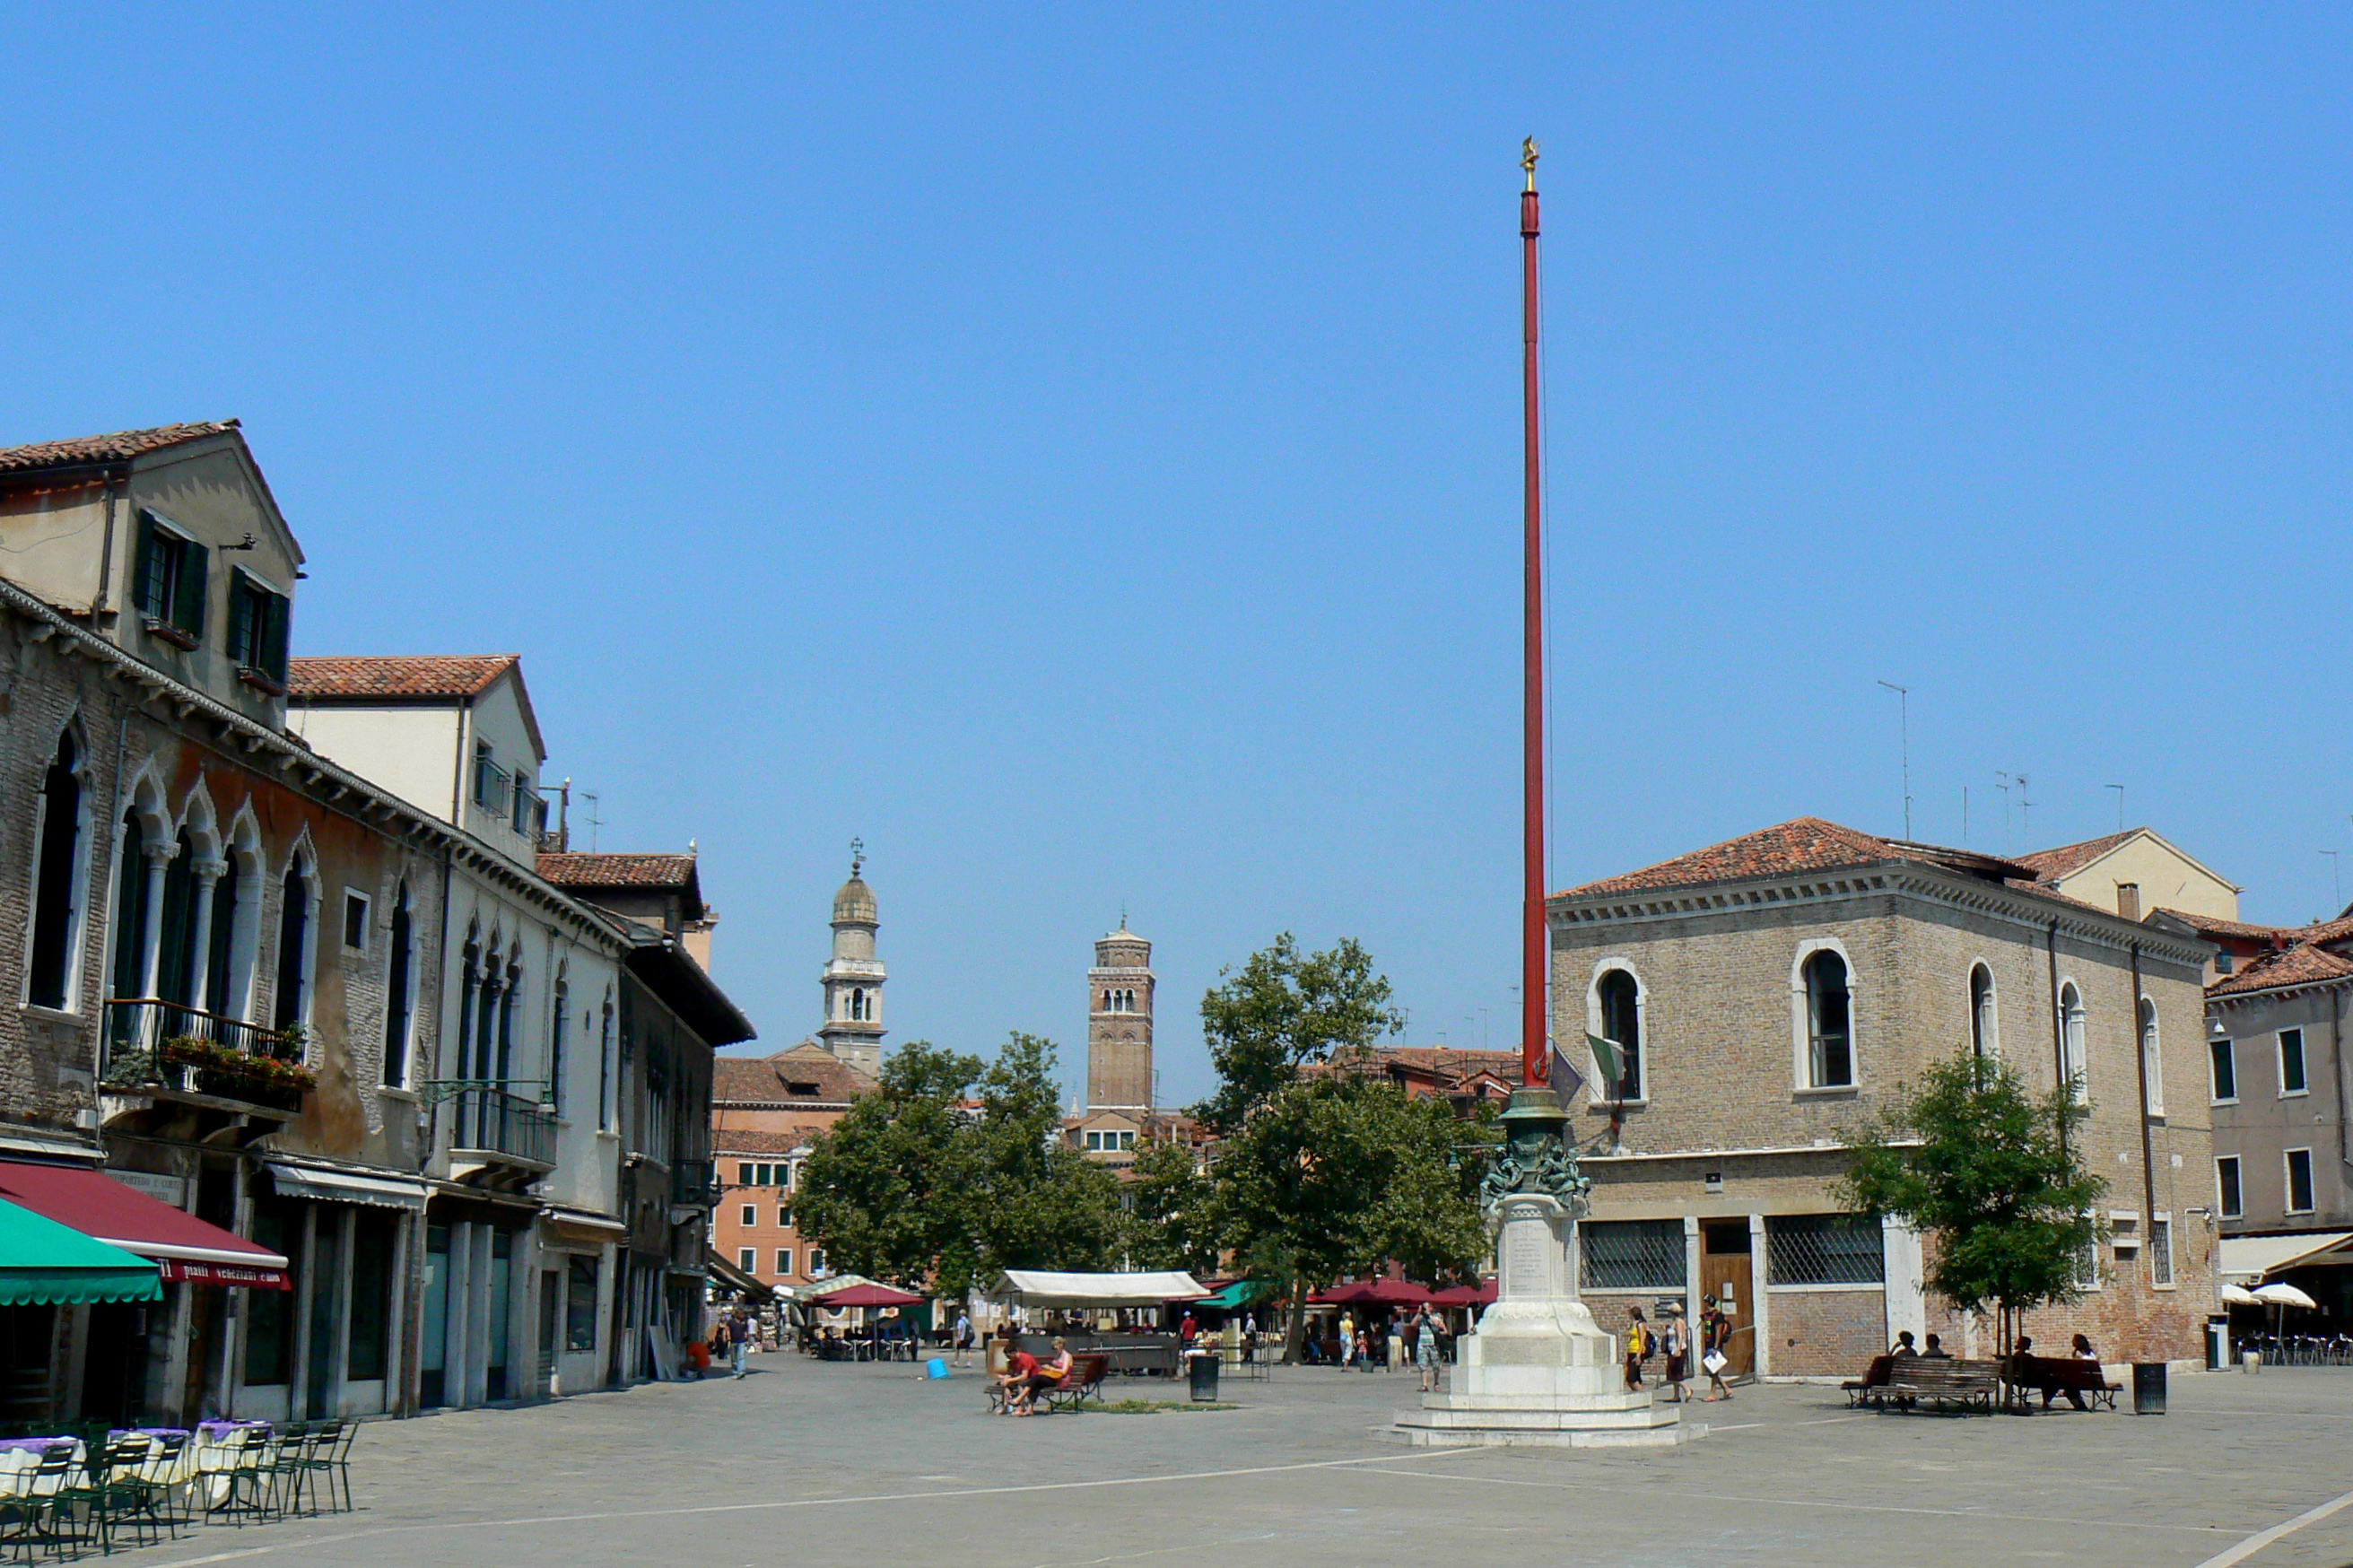 Campo Santa Margherita Venice Tourism